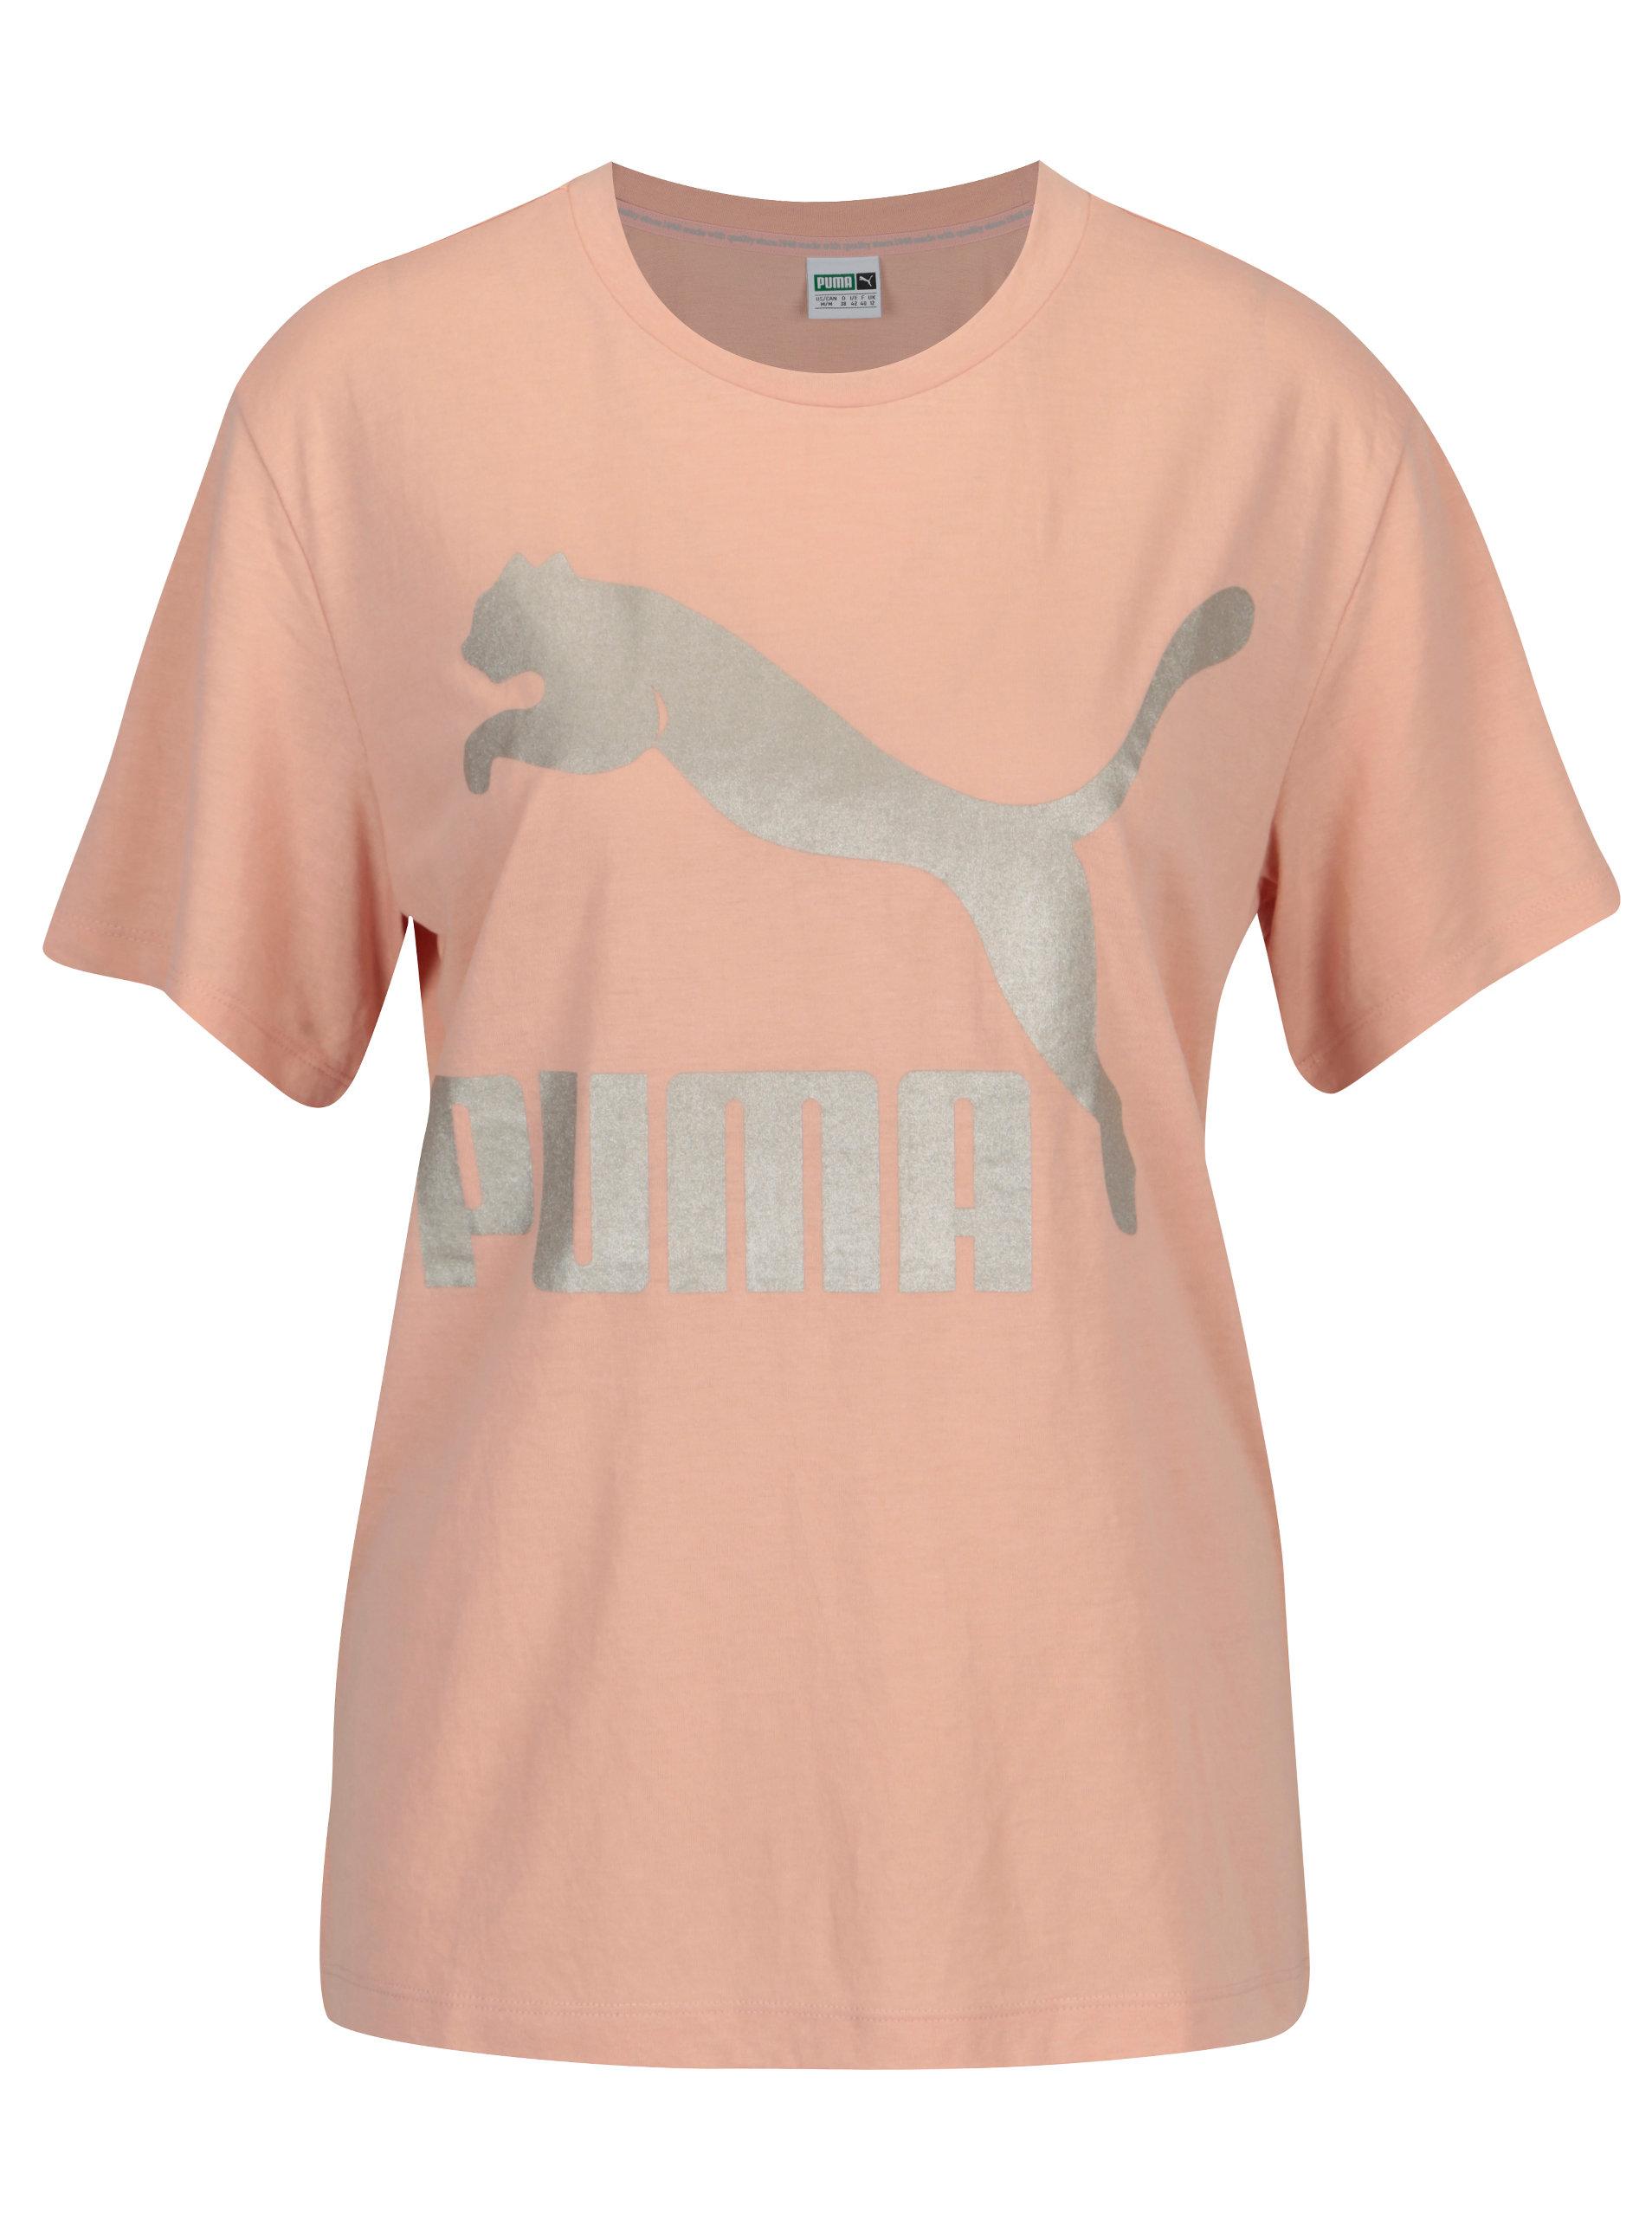 Růžové dámské tričko s potiskem Puma ... b32e58f532